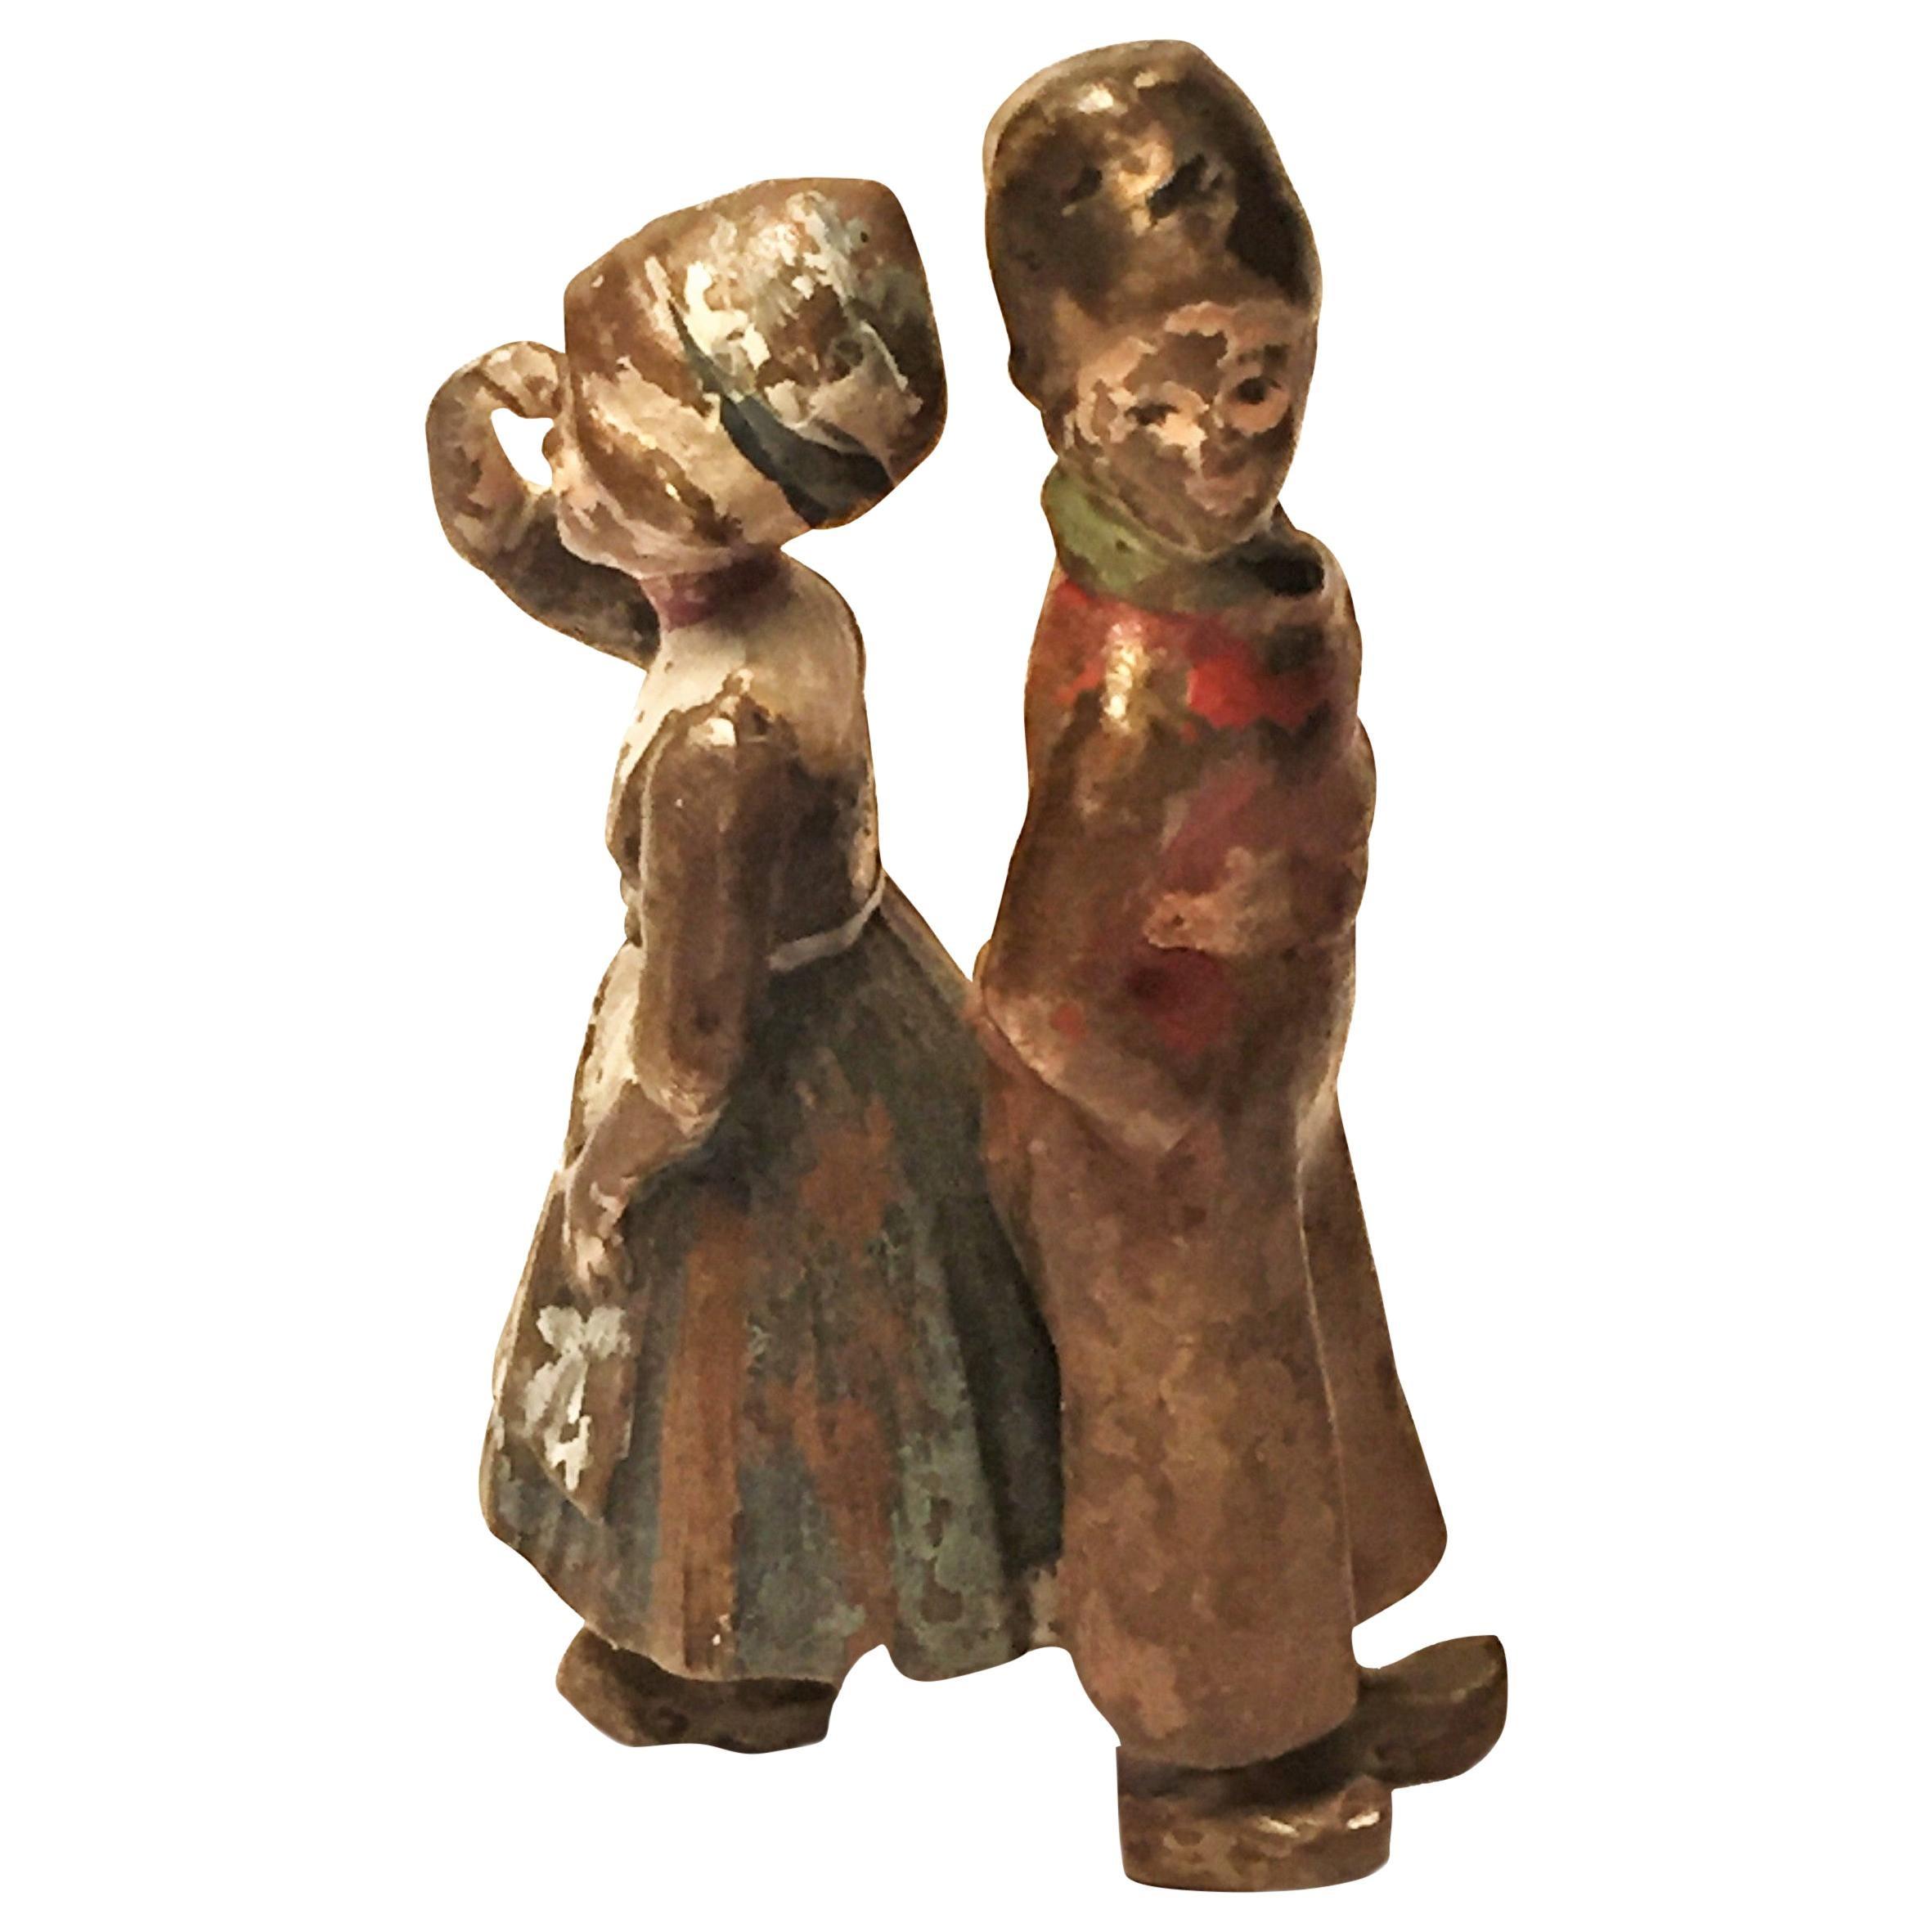 Franz Xavier Bergmann, Quarrel, Miniature Vienna Bronze Sculpture, circa 1900